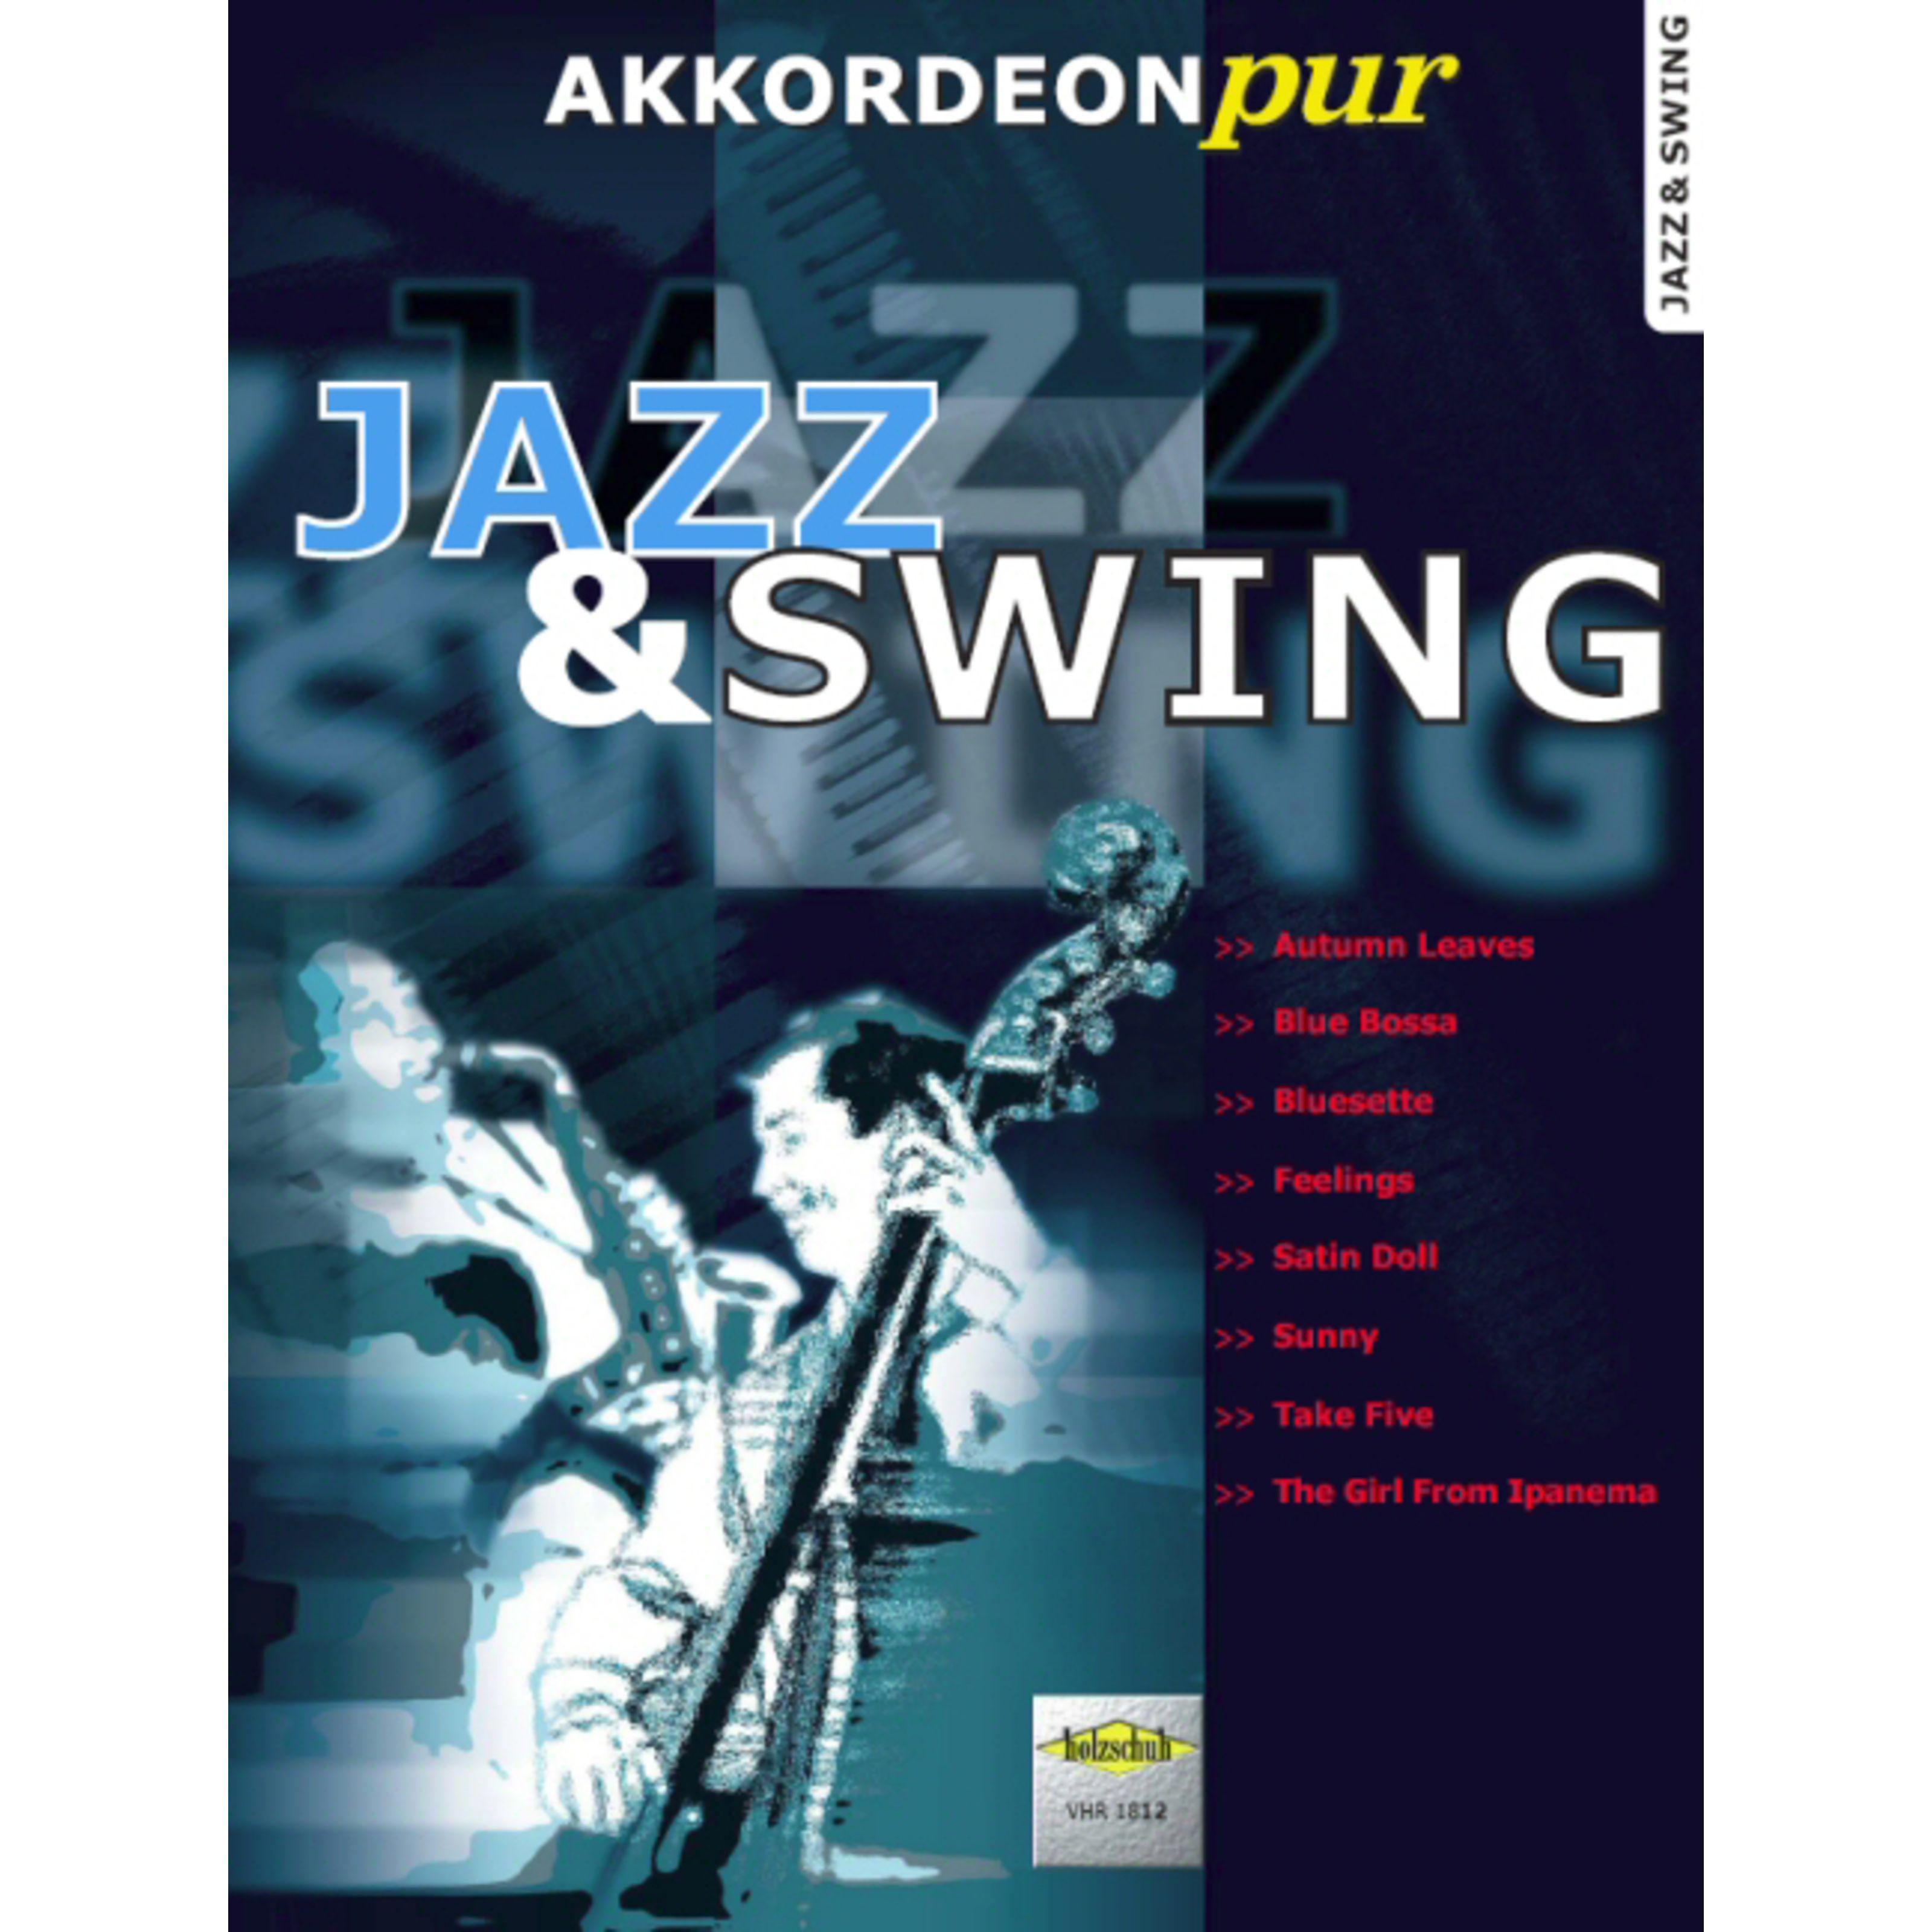 Holzschuh Verlag - Jazz & Swing 1 - AKKORDEONpur Hans-Günthert Kölz, Akkordeon VHR 1812